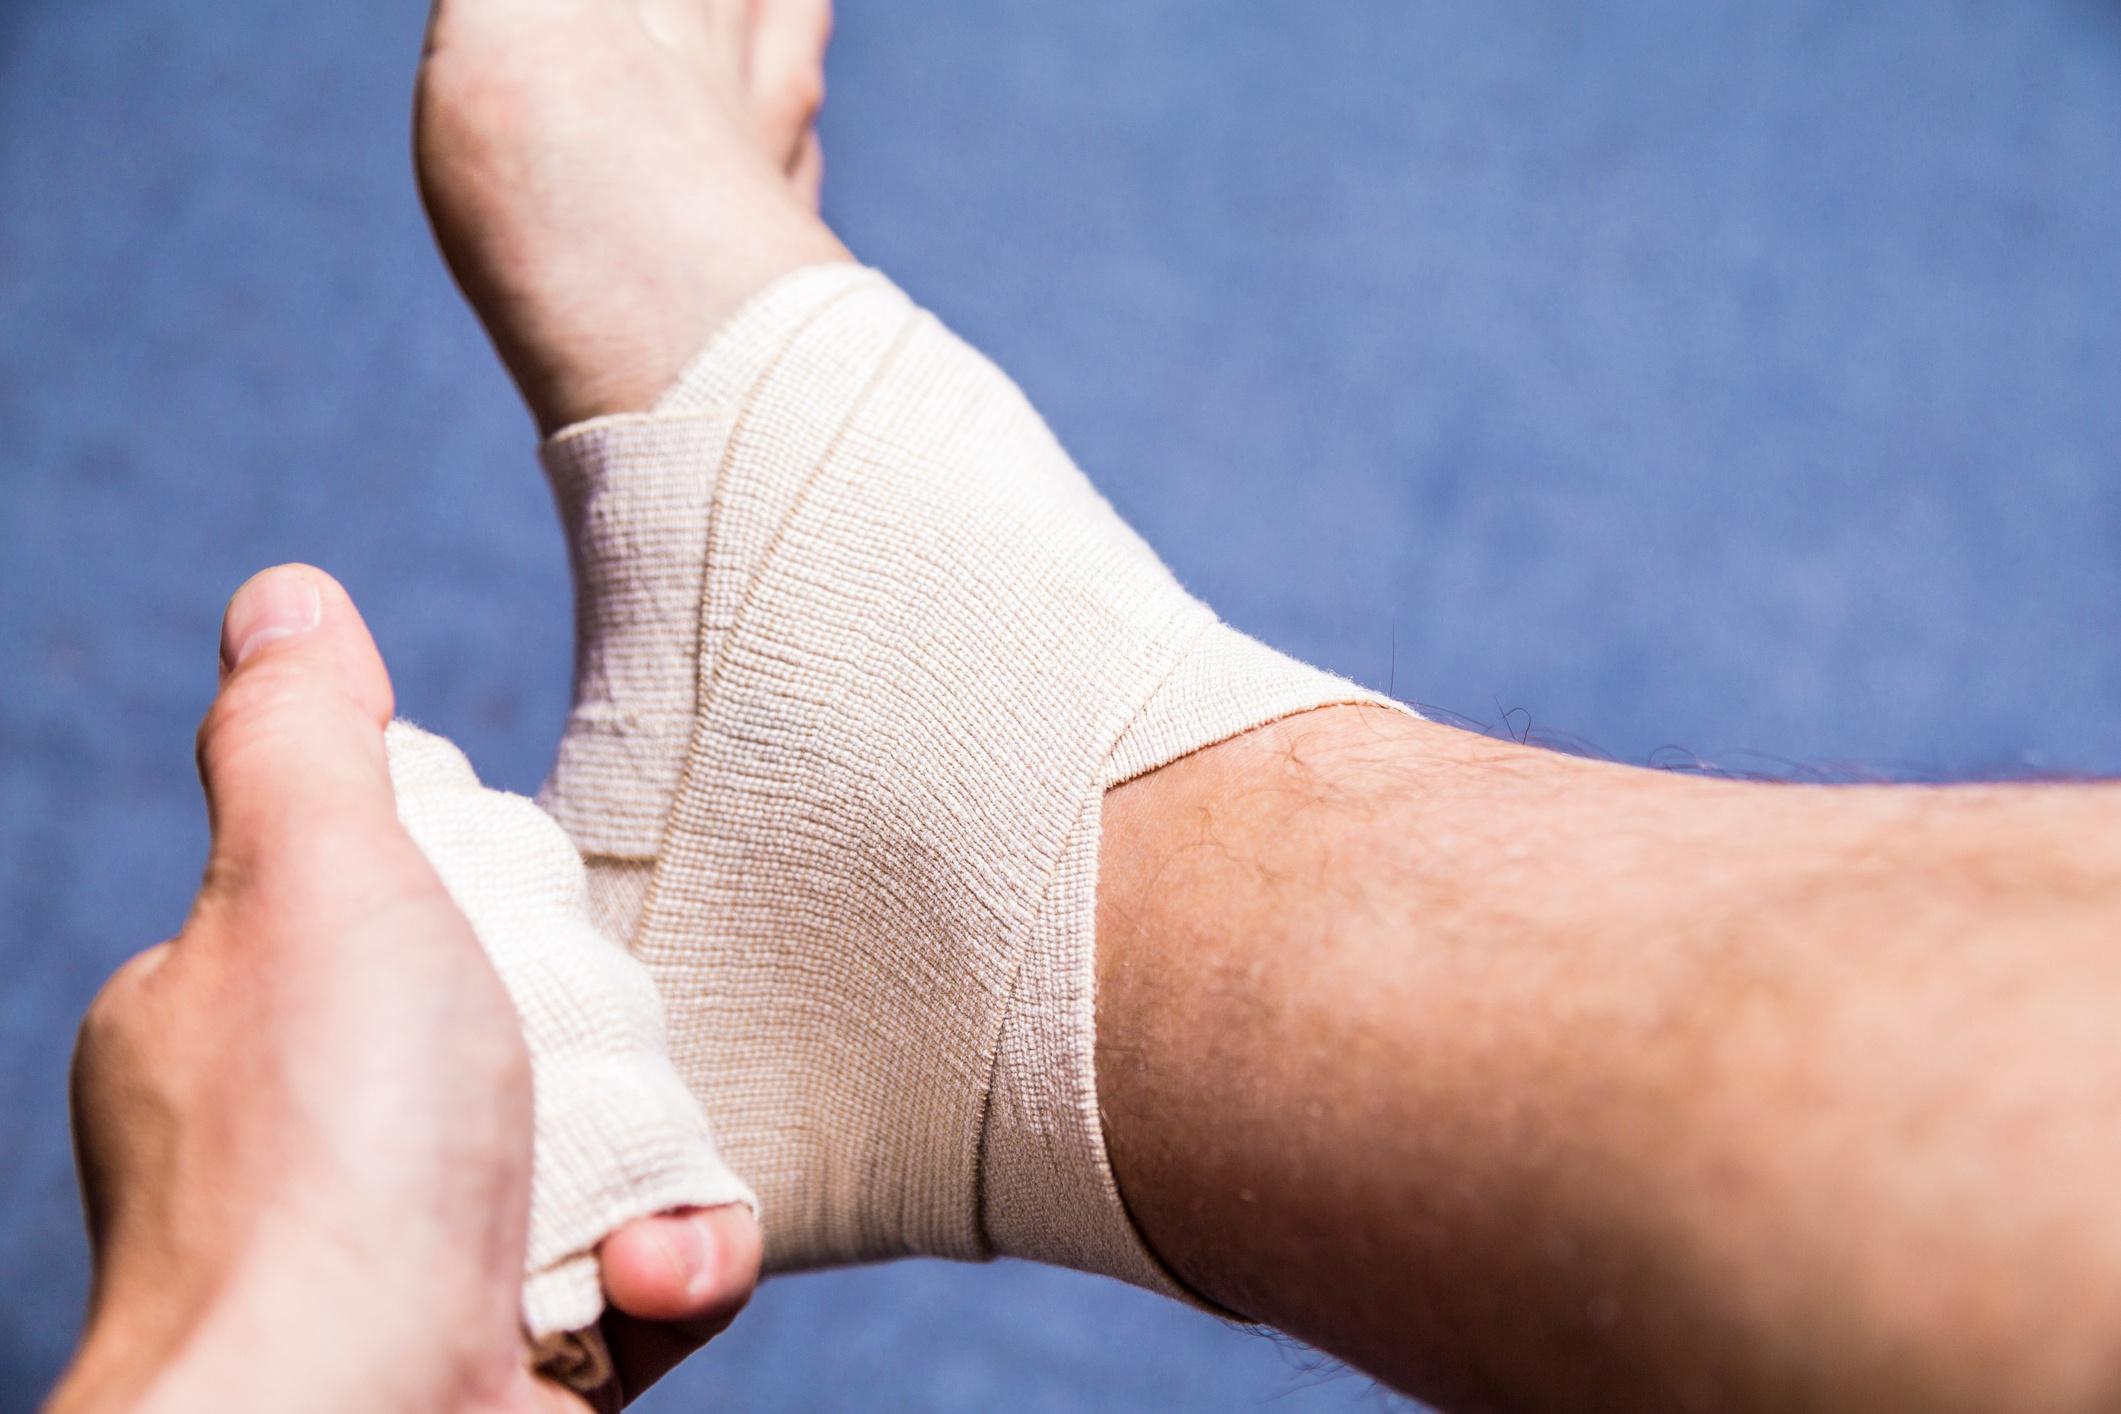 ankle sports injury bandage compress